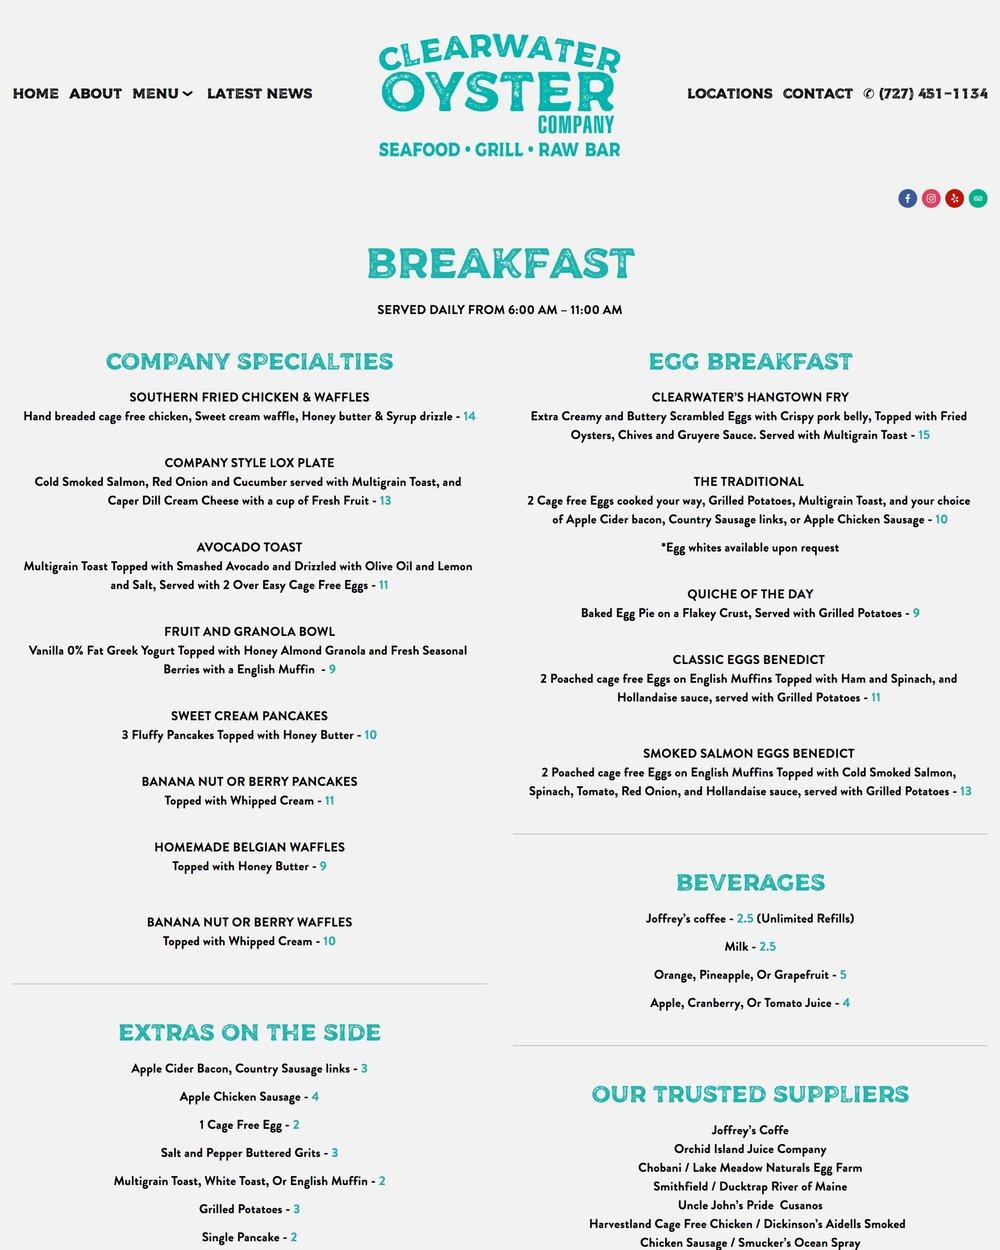 screencapture-clearwateroystercompany-breakfast-2019-03-14-12_51_08.png